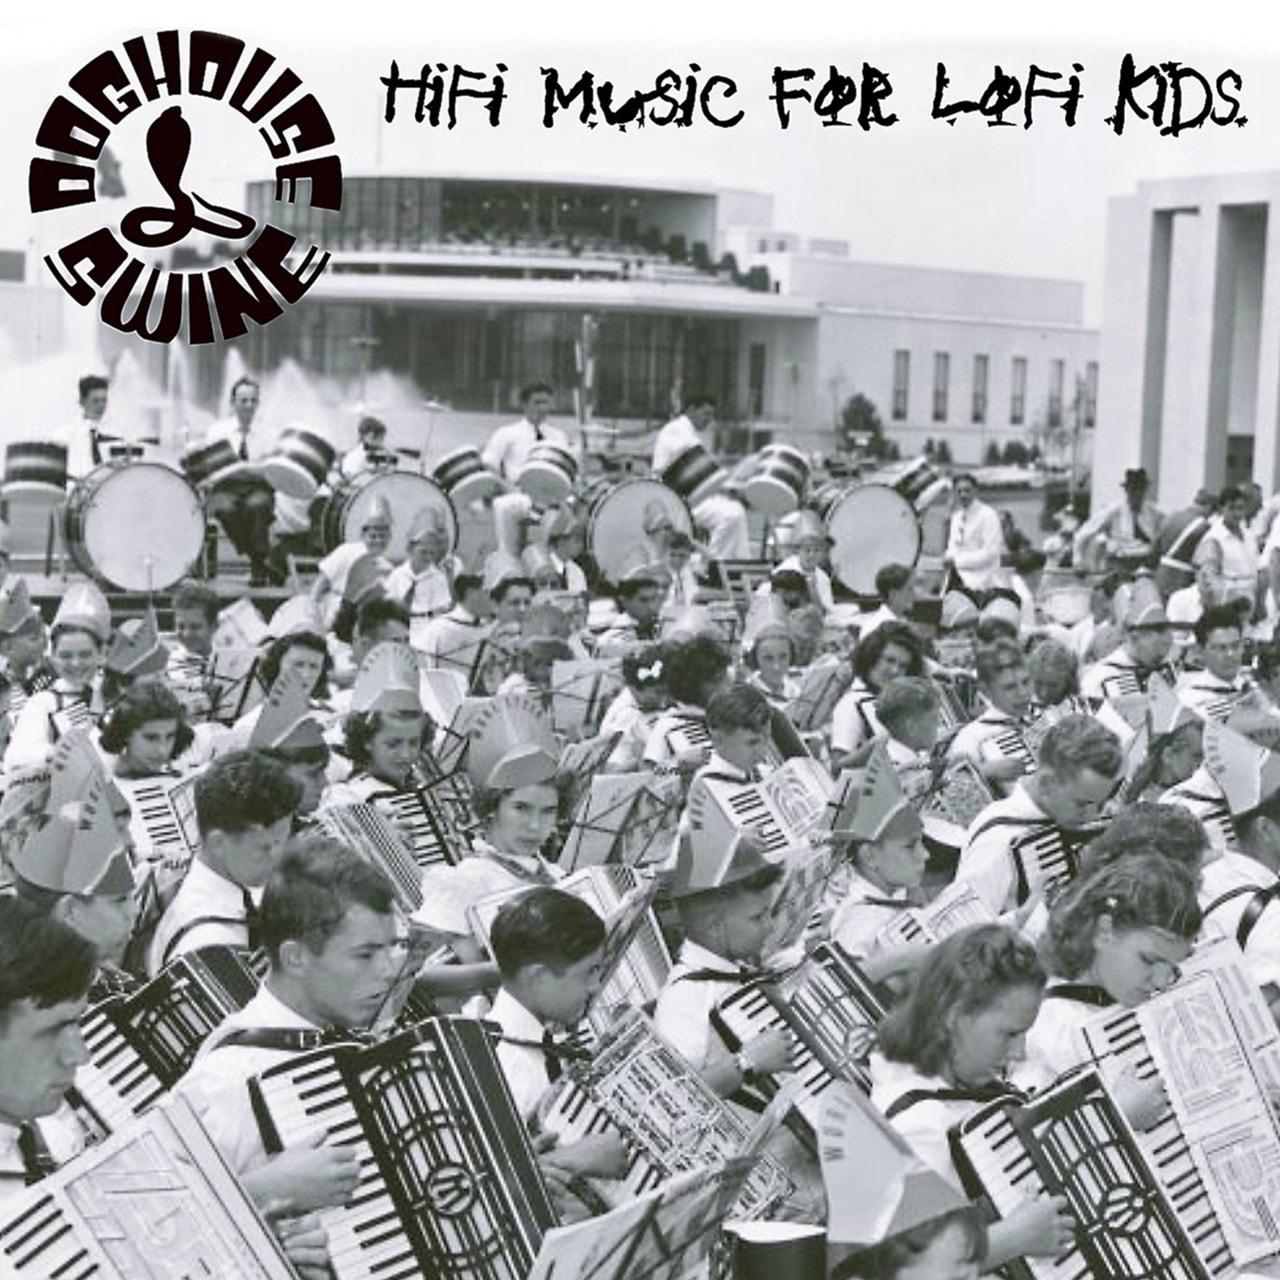 Hifi Music for Lofi Kids - 1